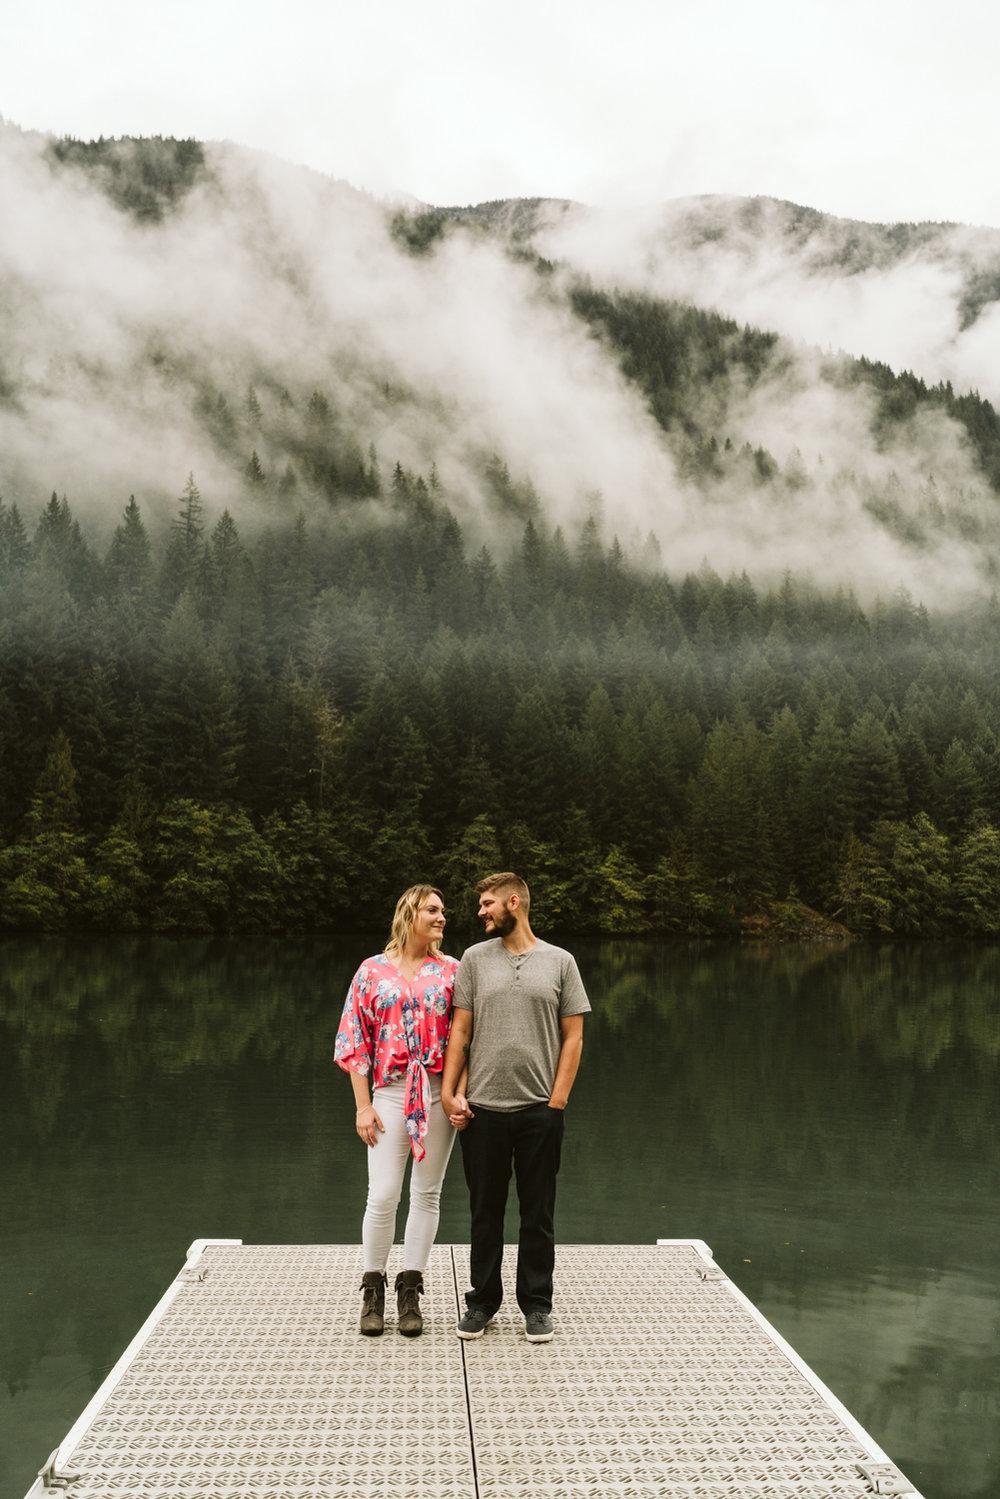 April Yentas Photography - Shaina & Andy_-13.jpg